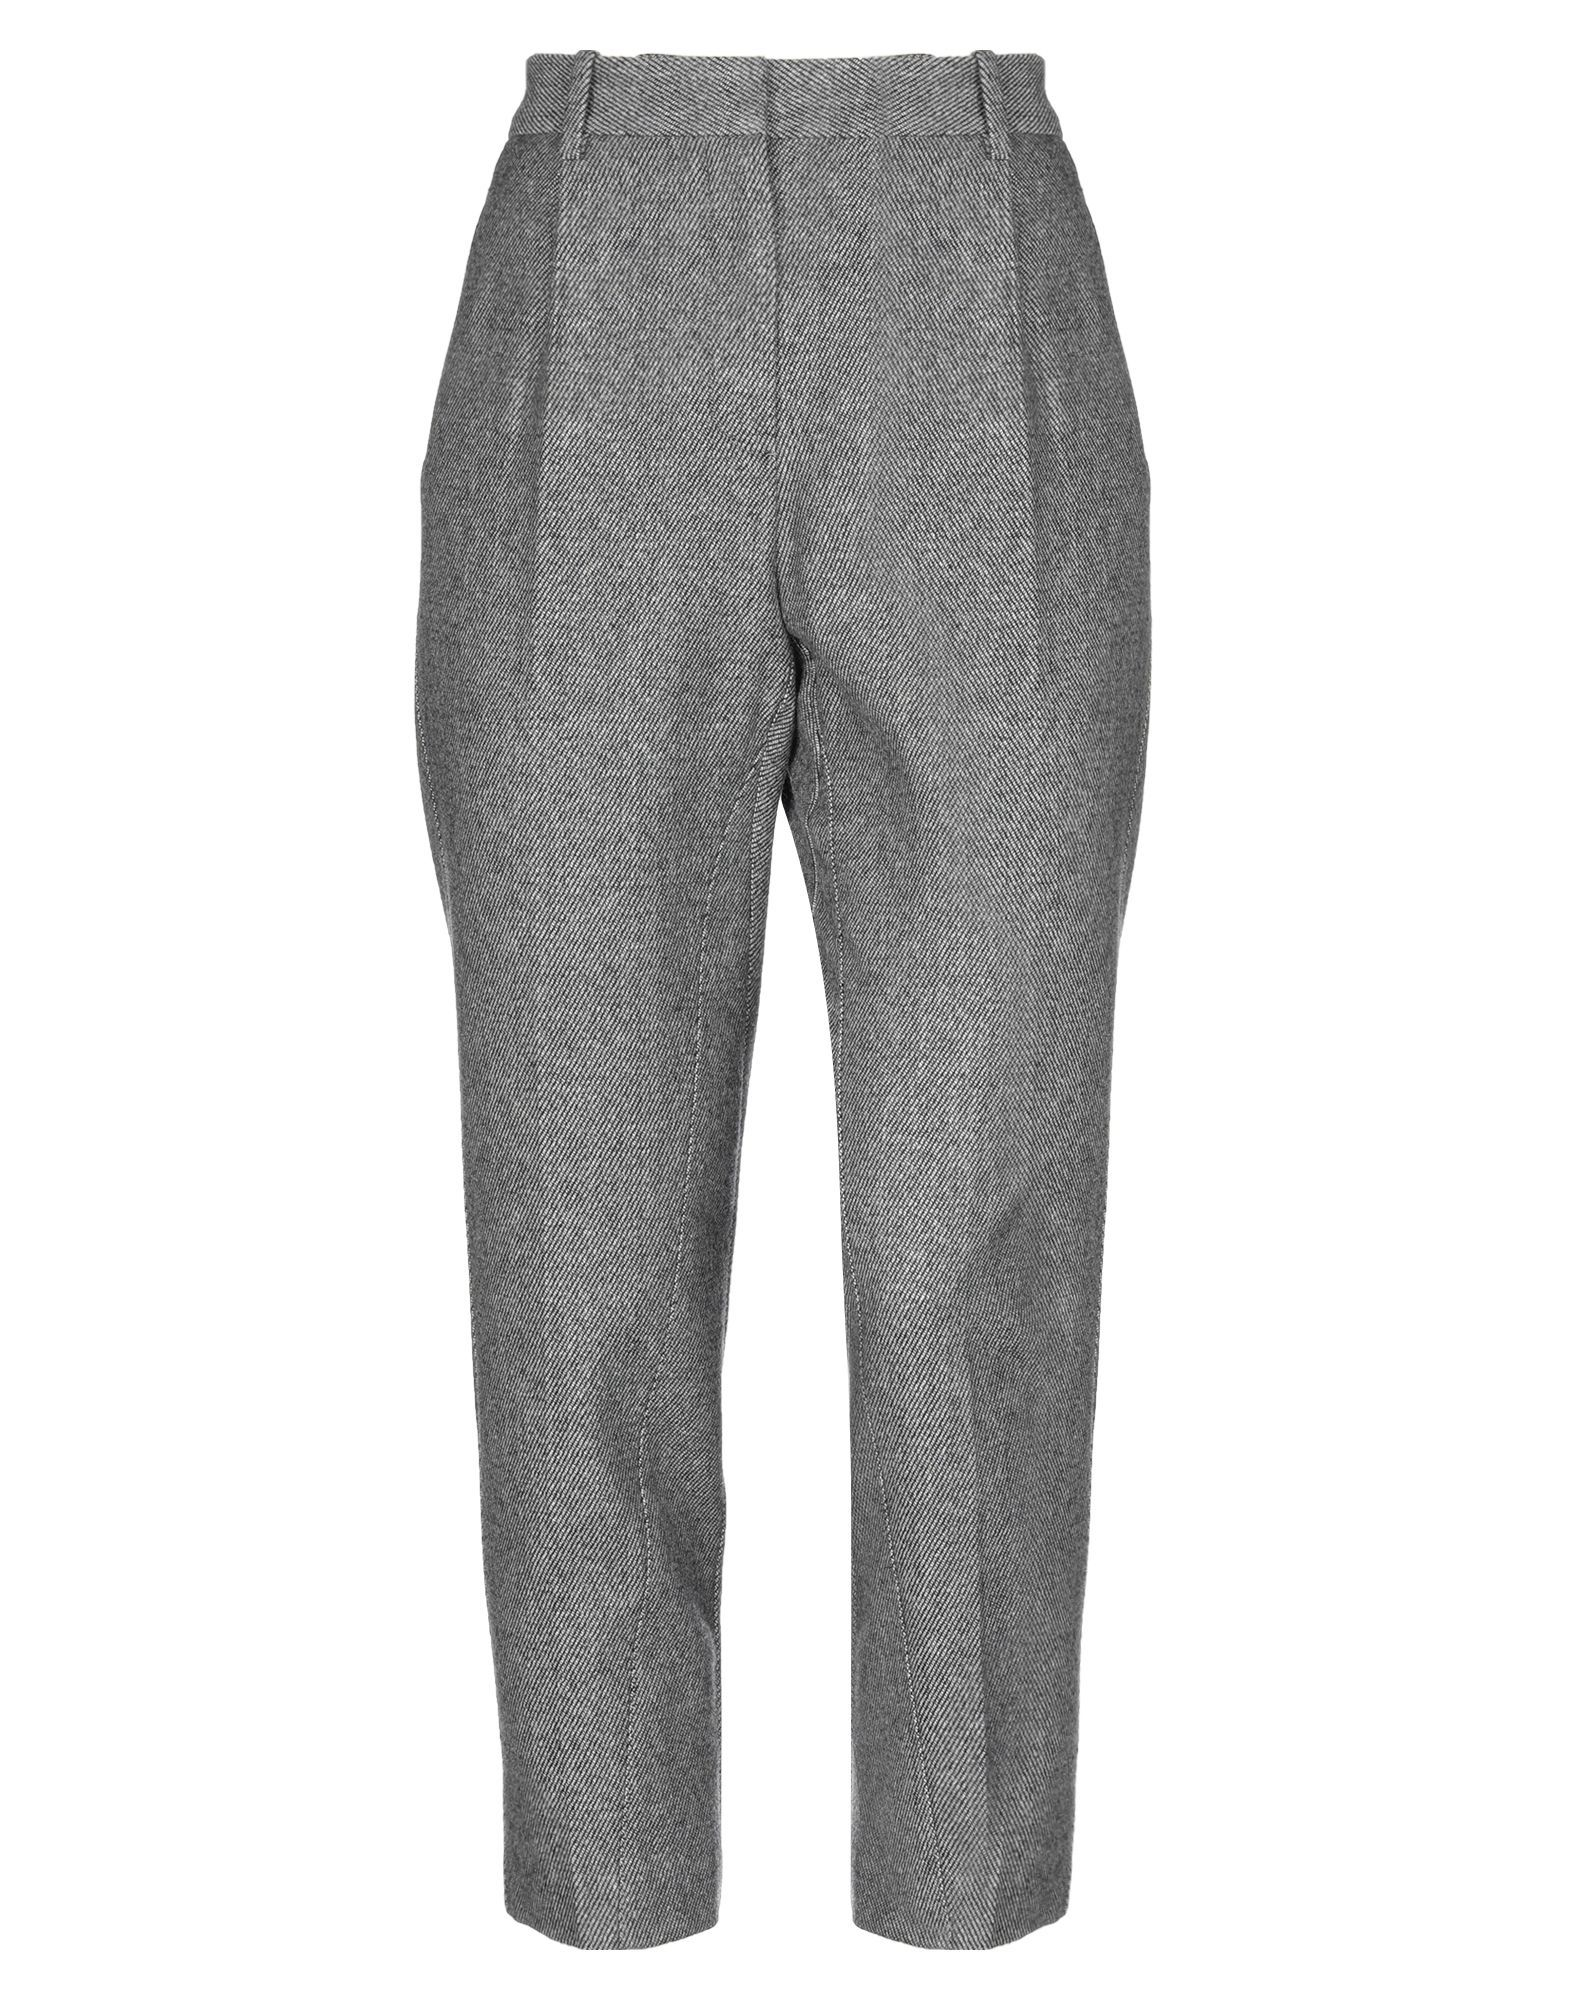 TROUSERS Maje Grey Woman Wool